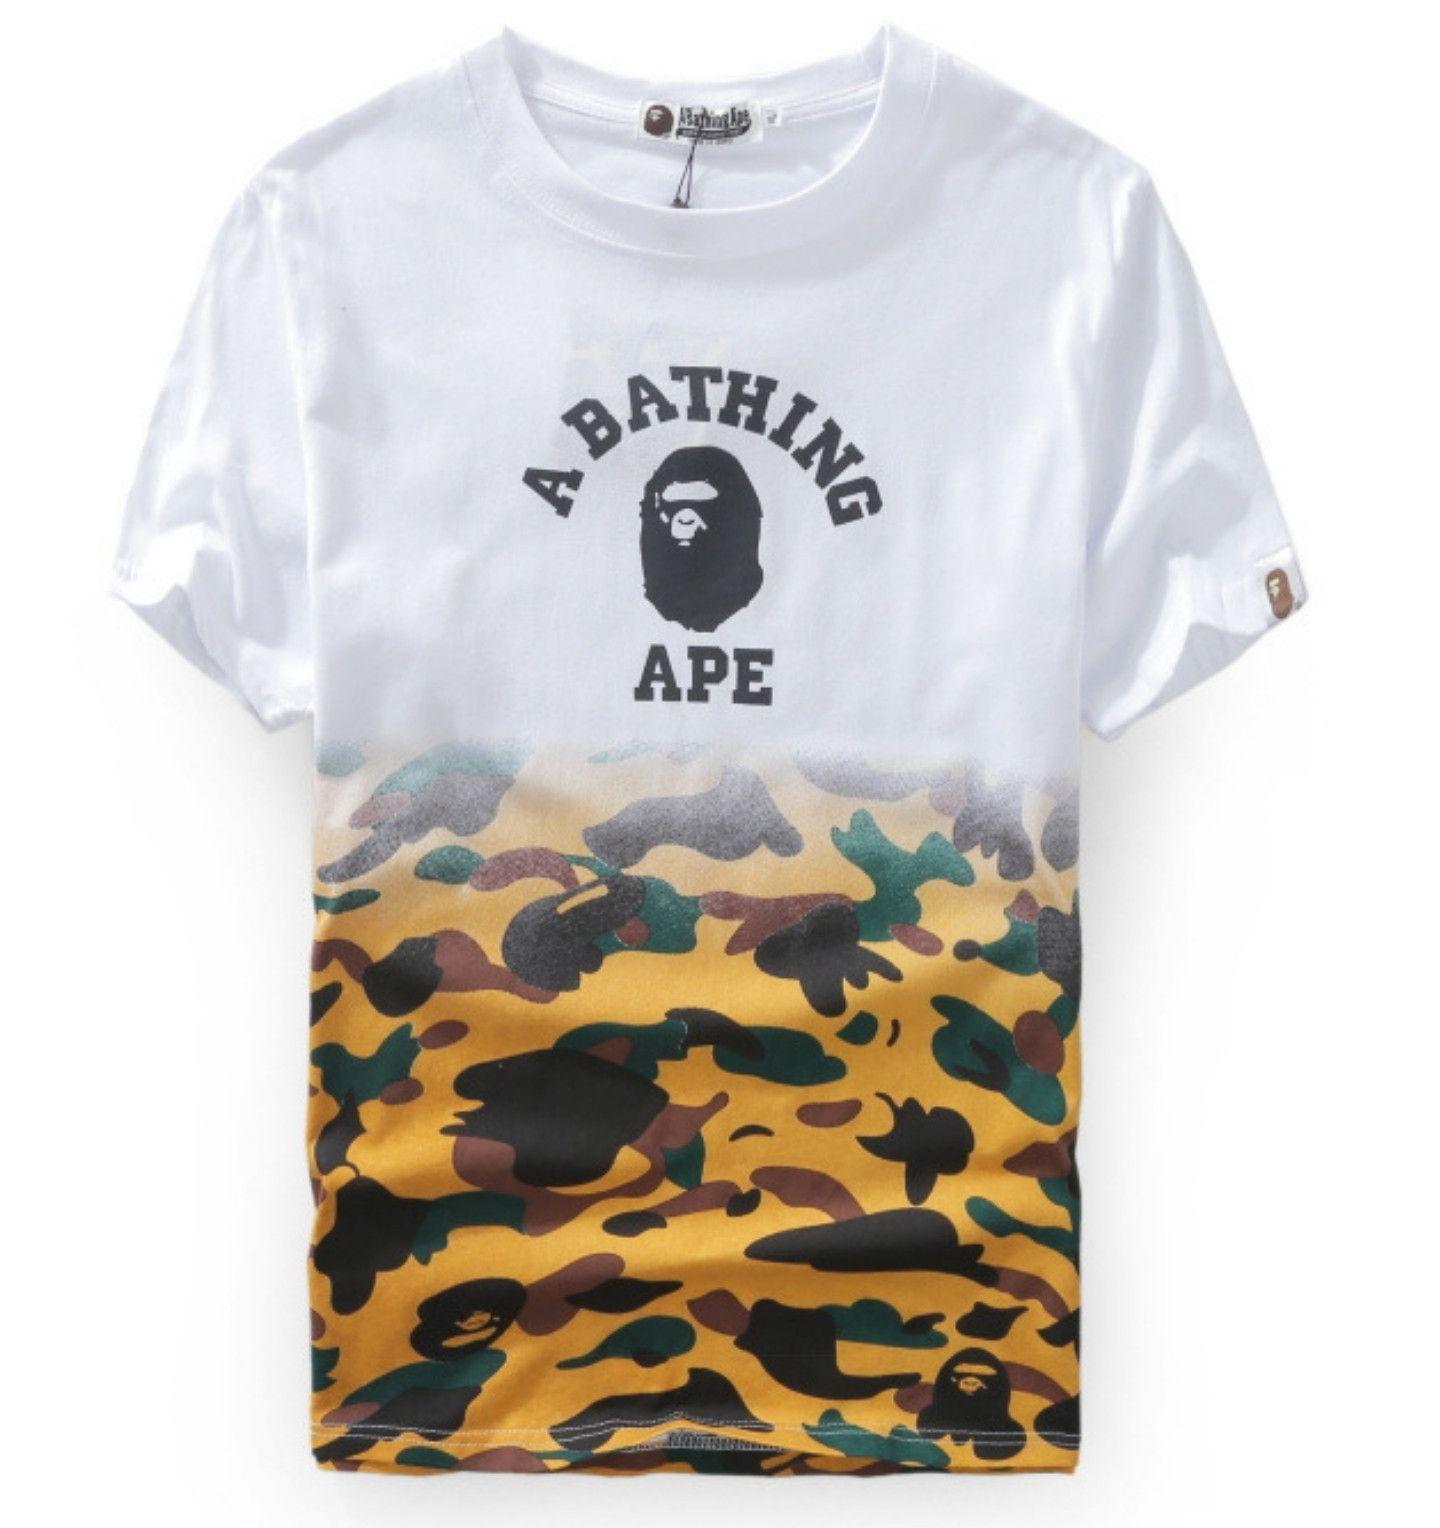 b91003fe8954b Camo Bape Shirt | Clothing | Bape shirt, Bape t shirt, Bape